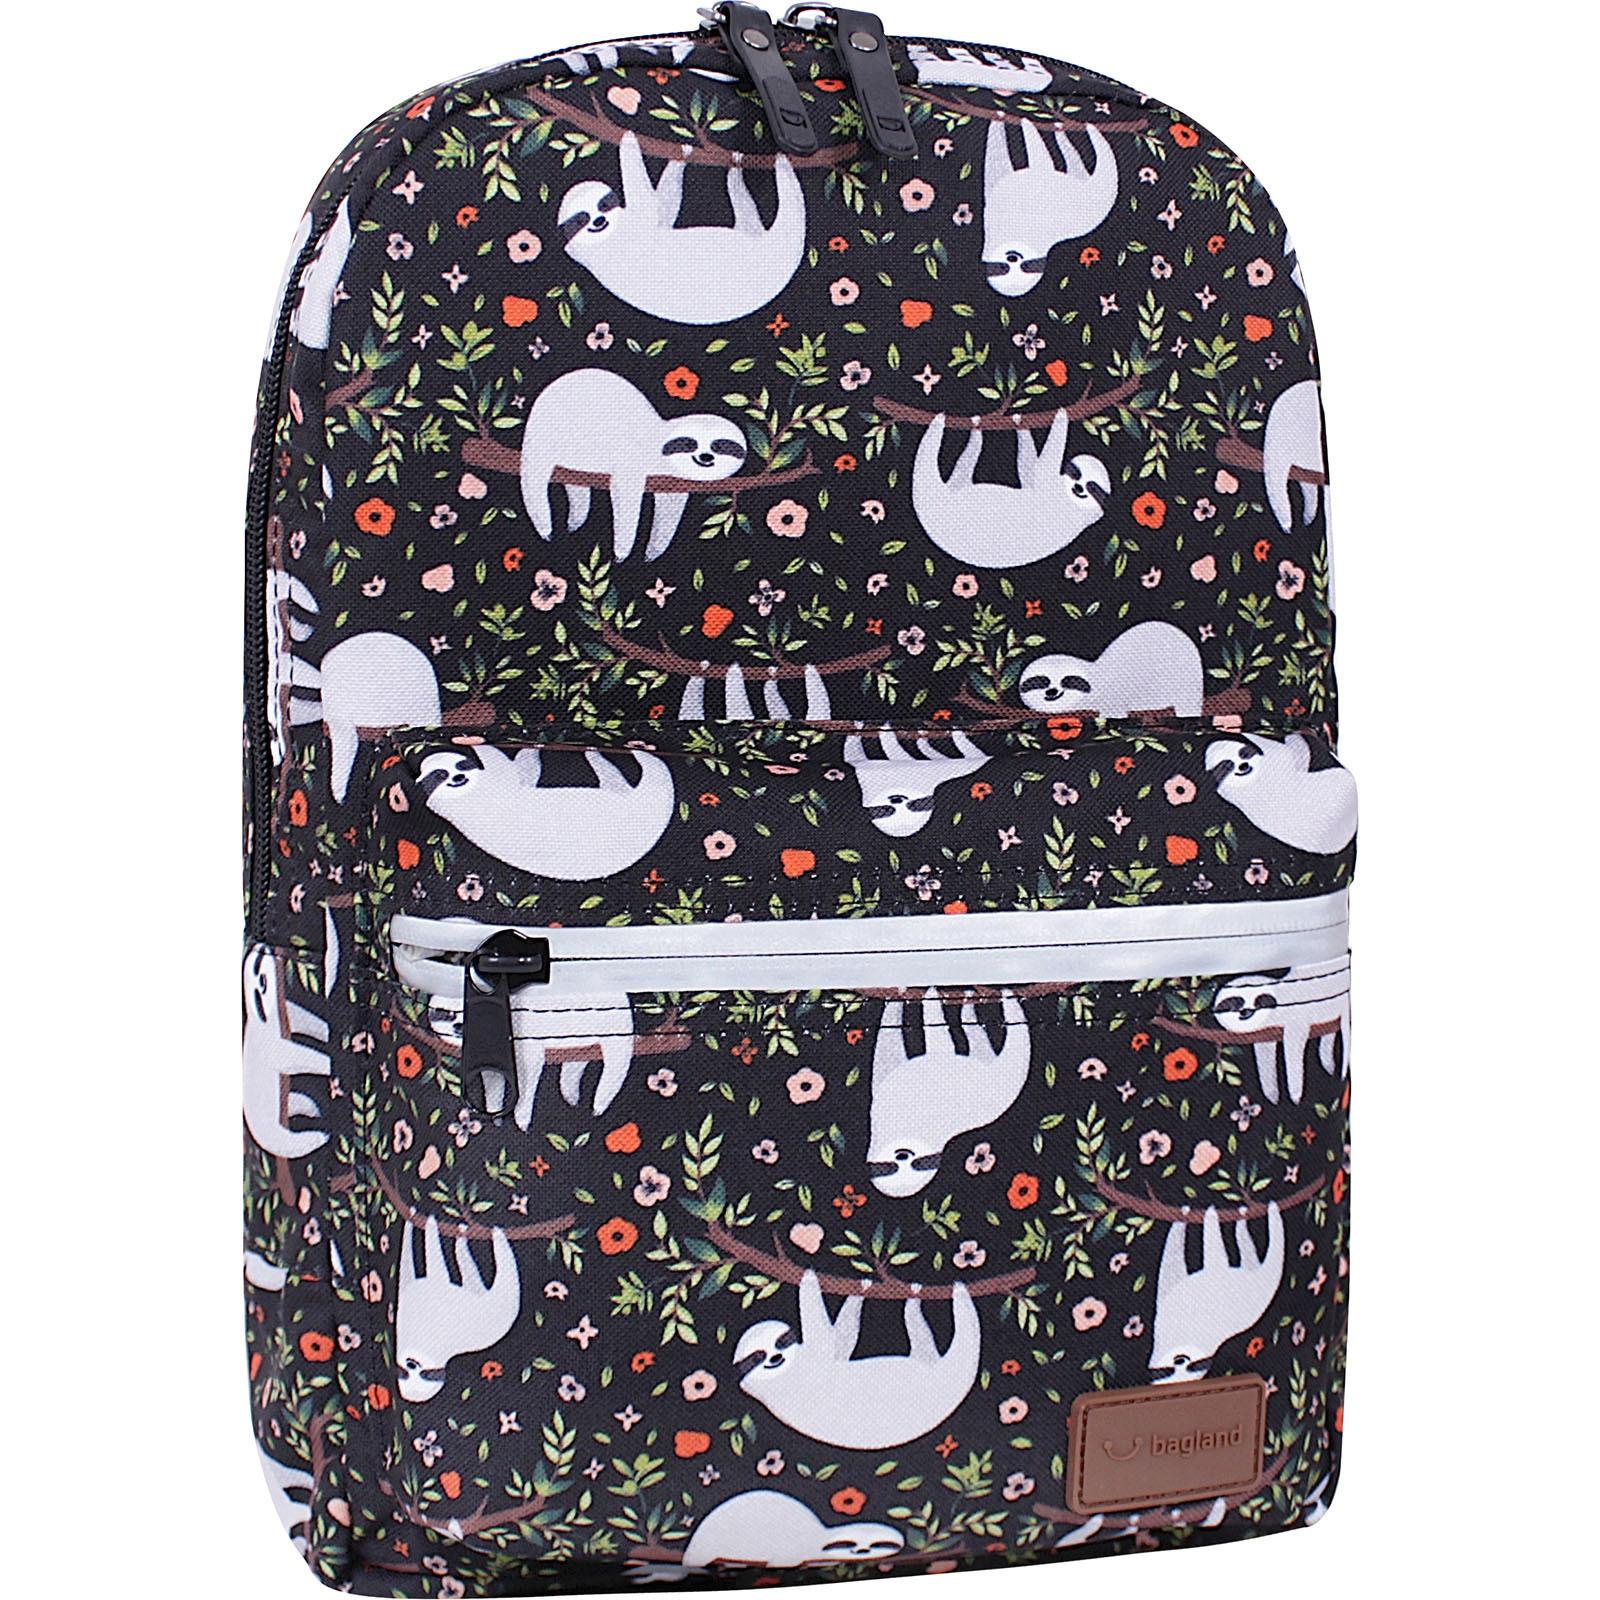 Молодежные рюкзаки Рюкзак Bagland Молодежный mini 8 л. сублимация 743 (00508664) IMG_1296суб.743.JPG